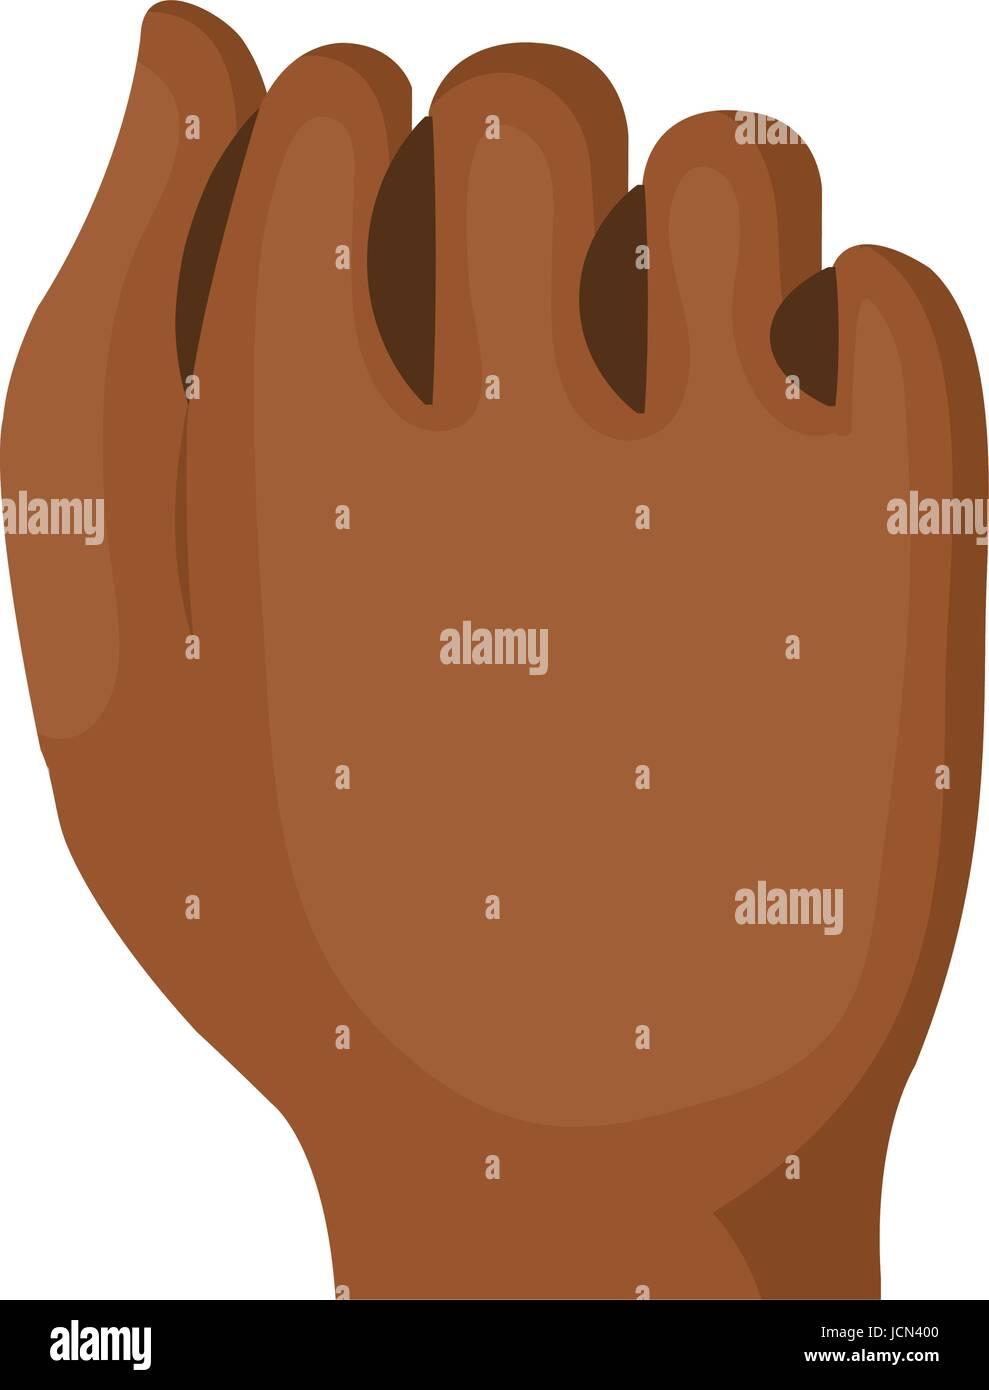 hand human fist icon - Stock Vector